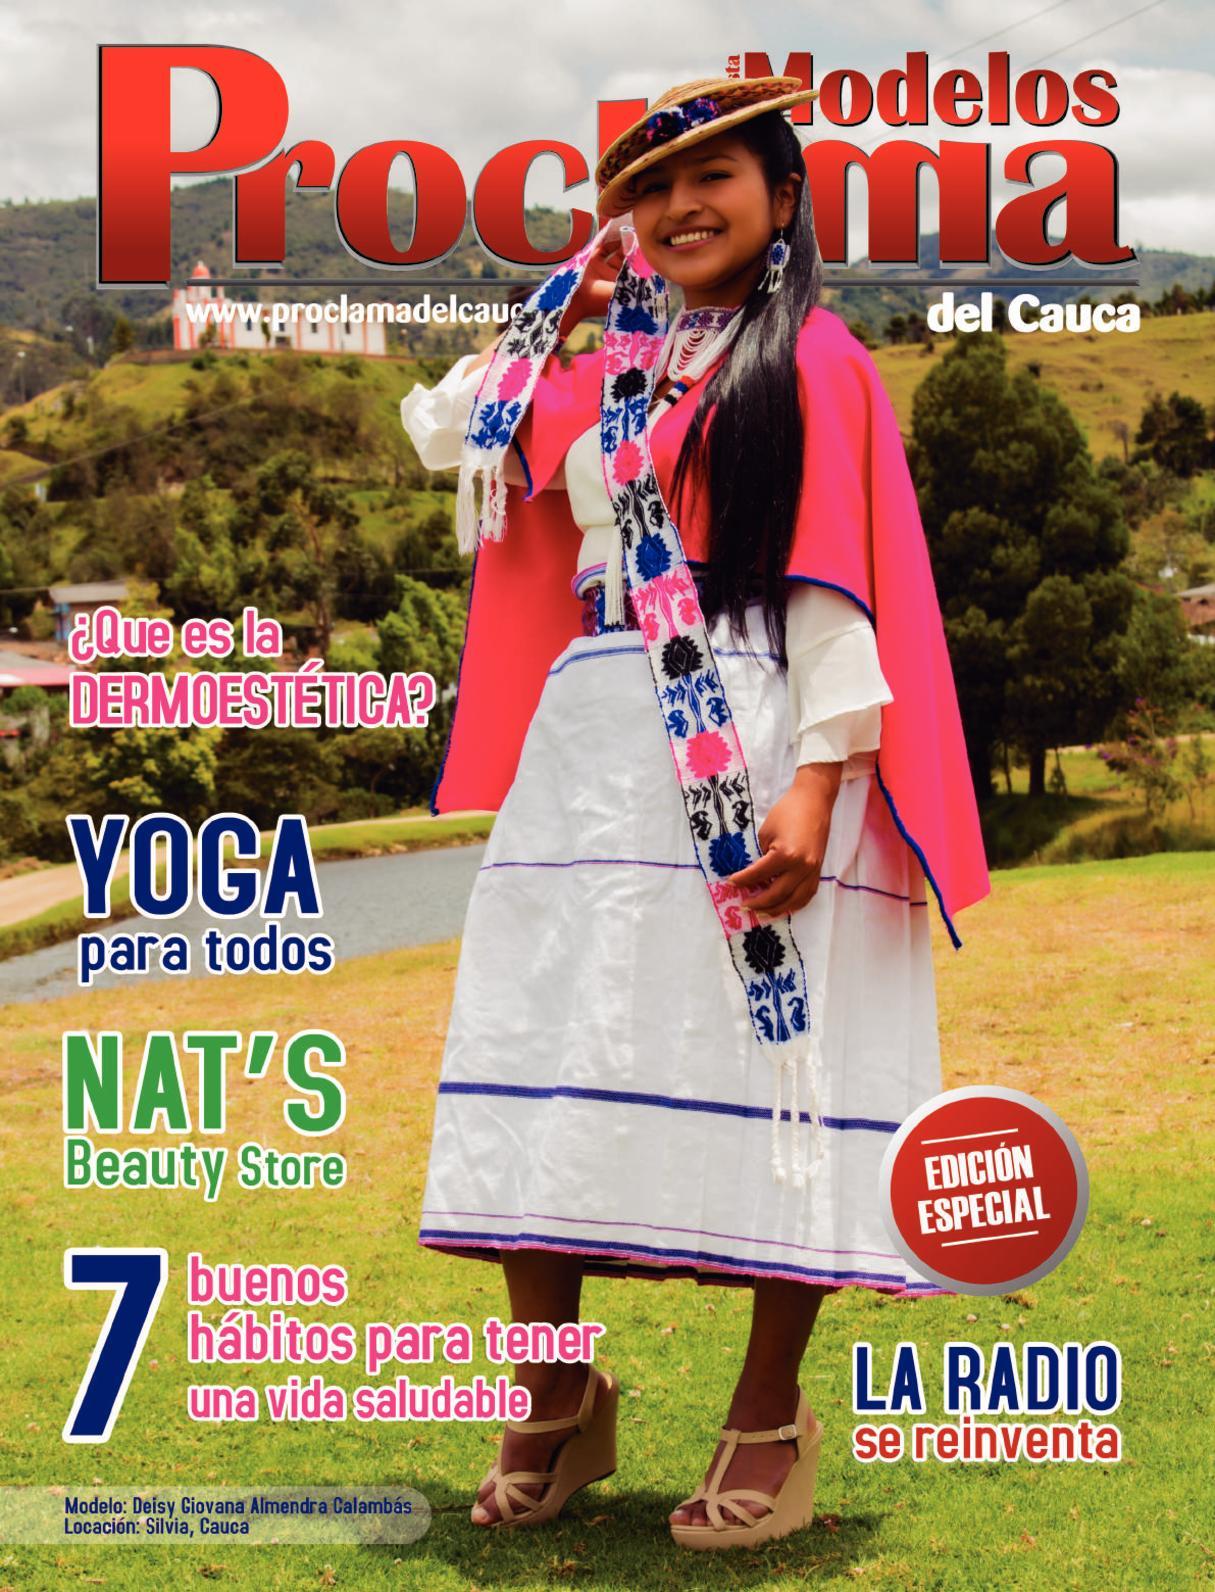 Revista Modelos Proclama del Cauca 2017